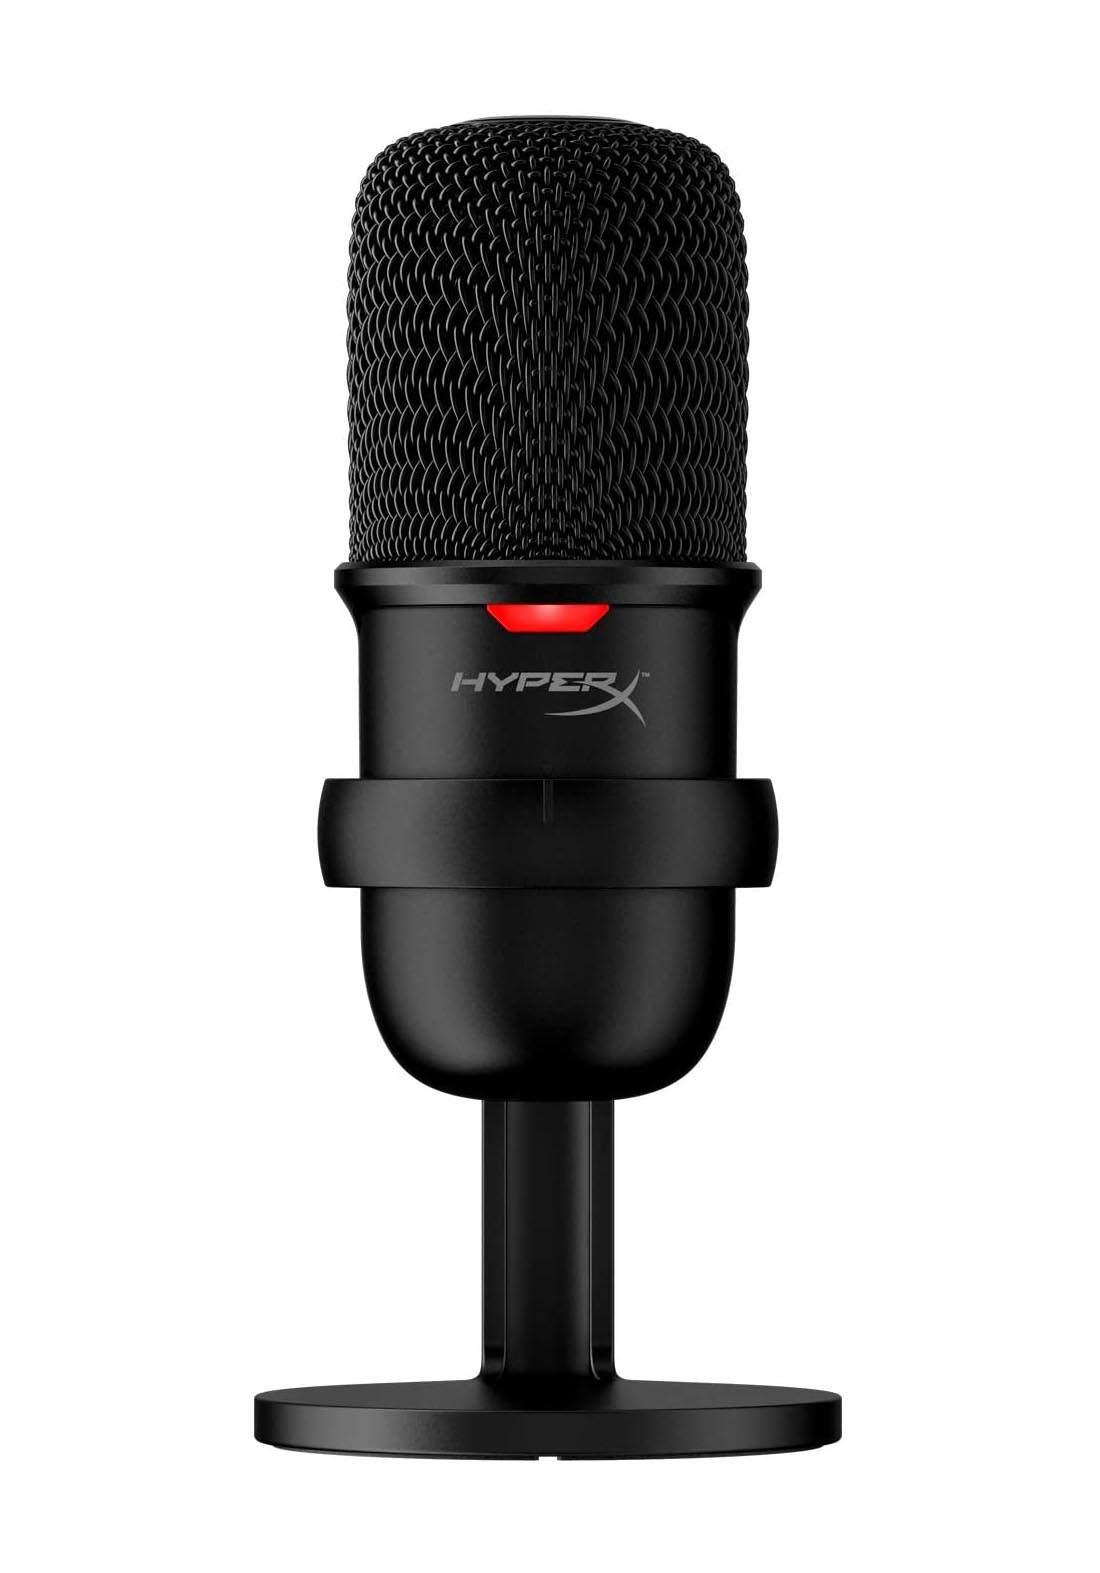 HyperX SoloCast  USB Condenser Gaming Microphone   - Black مايكرفون